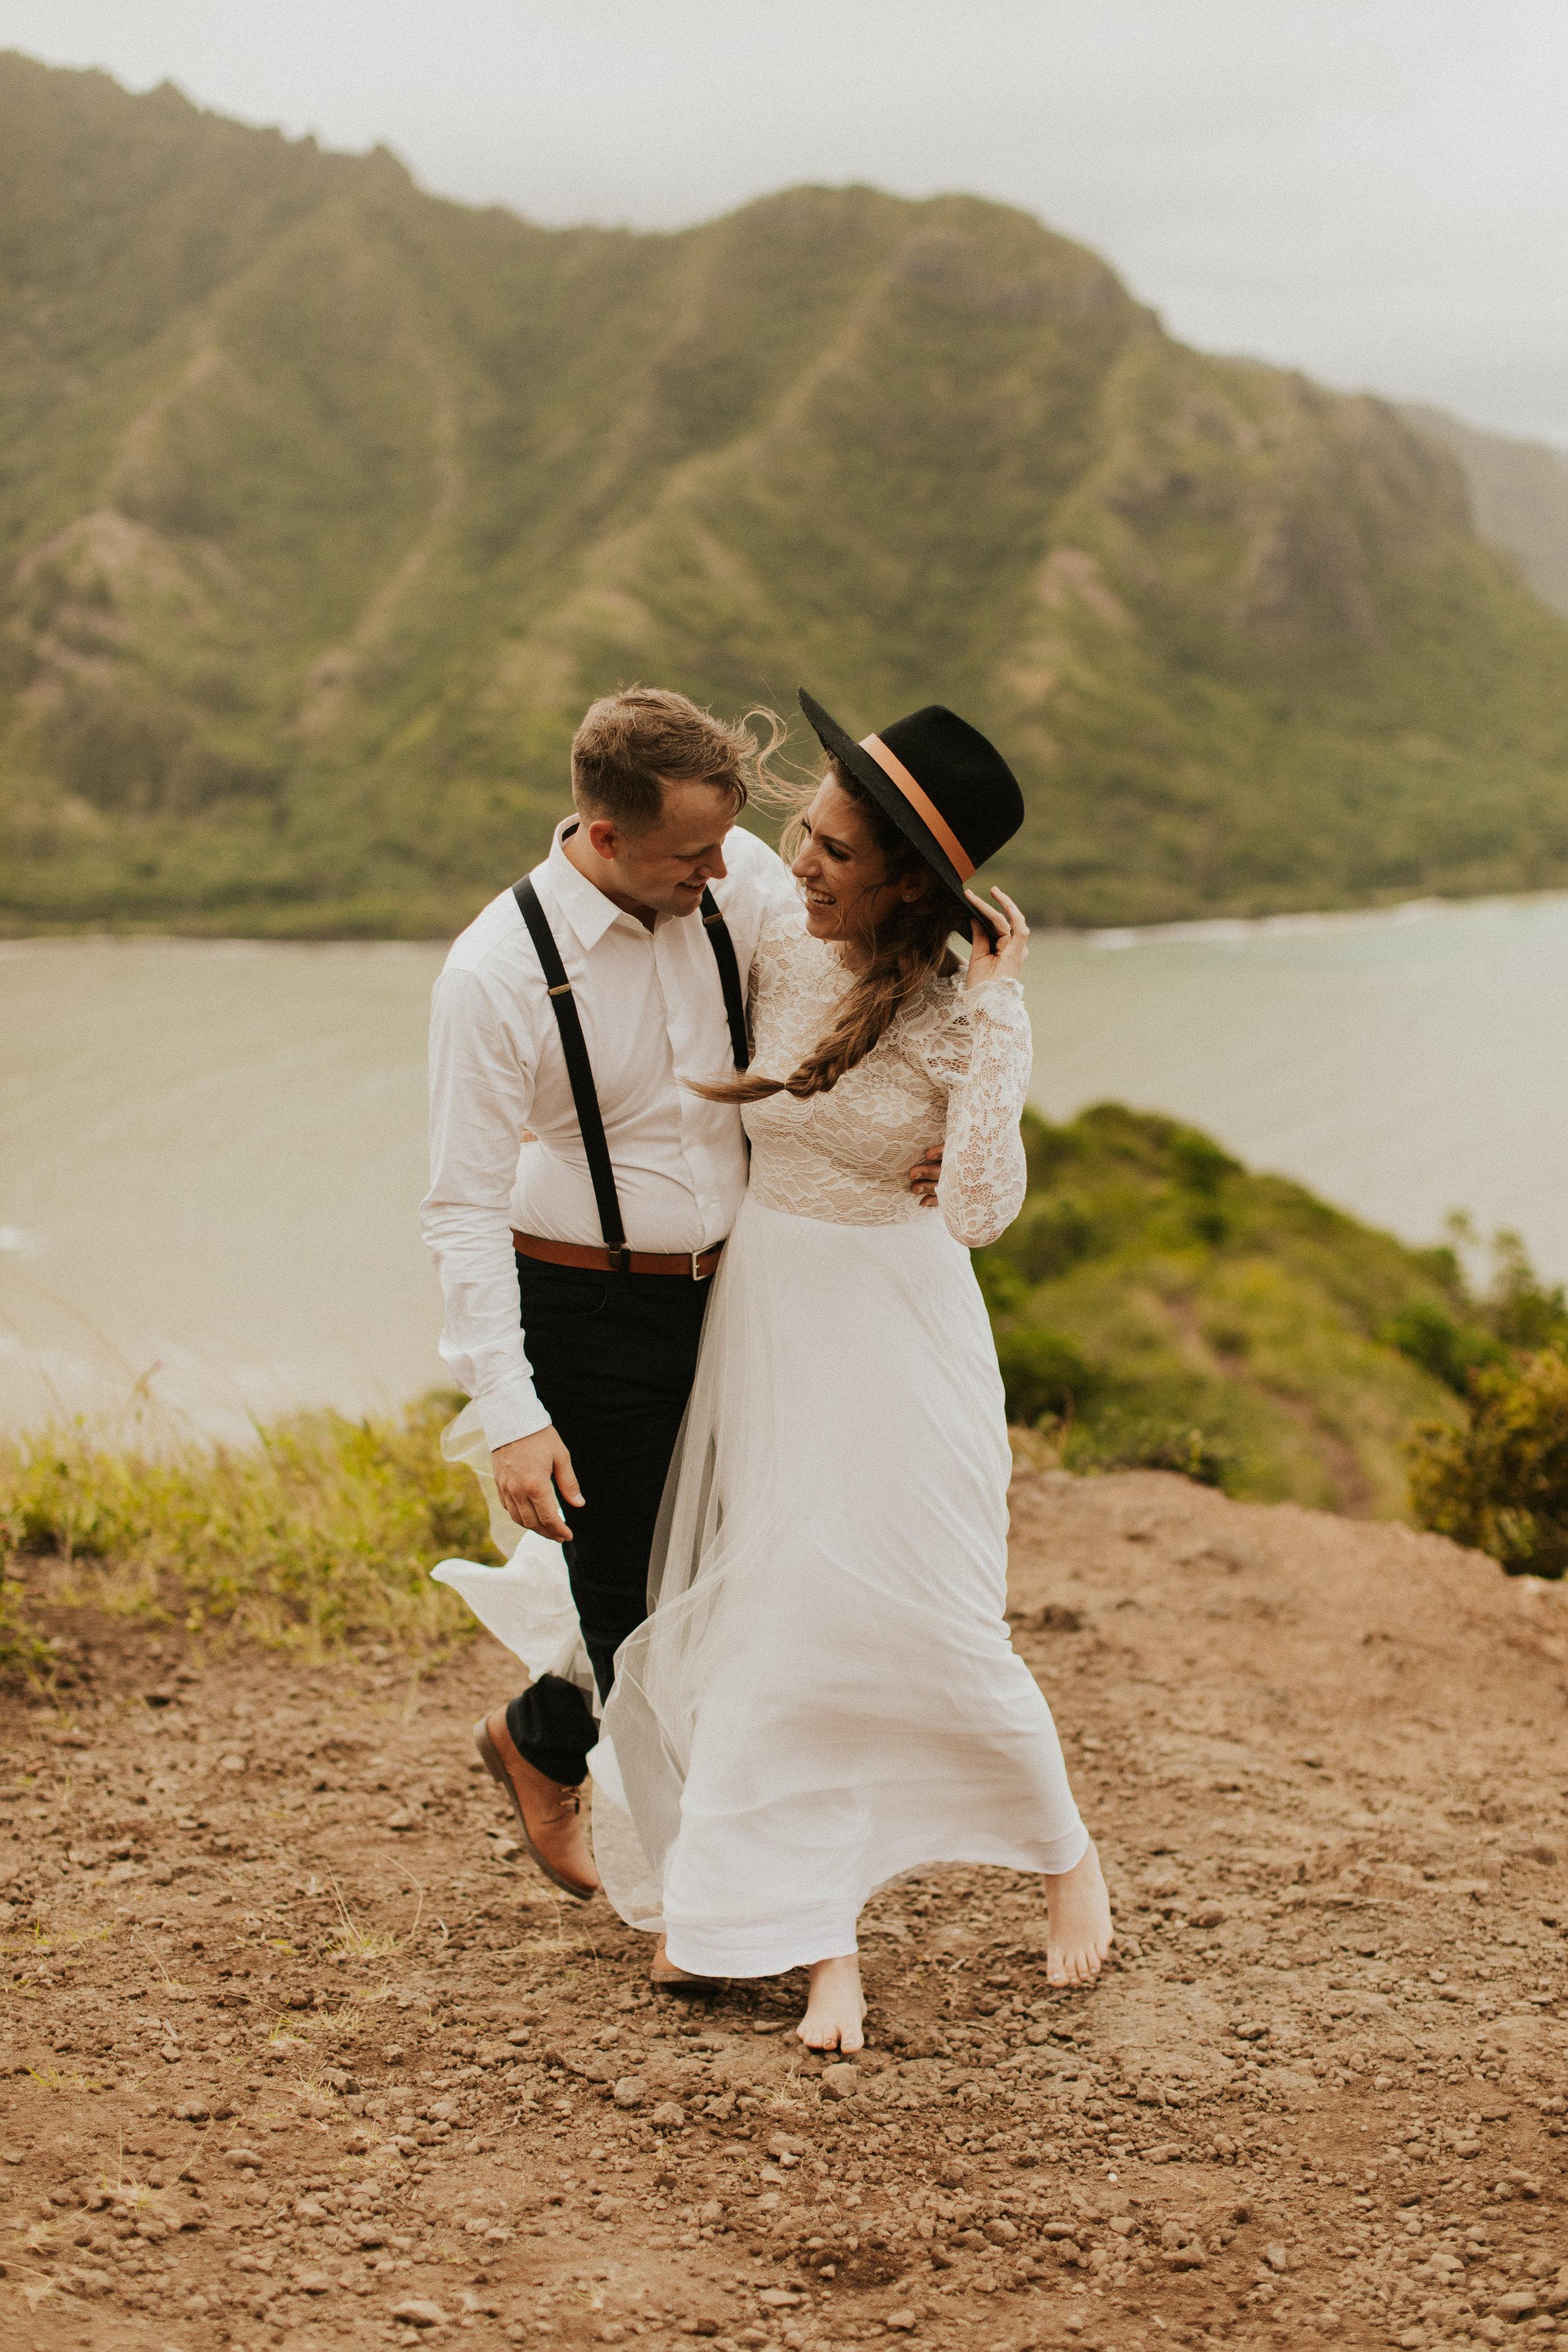 the-mclachlans-destination-elopement-photographers-mountain-hike-sena-eric-60.jpg